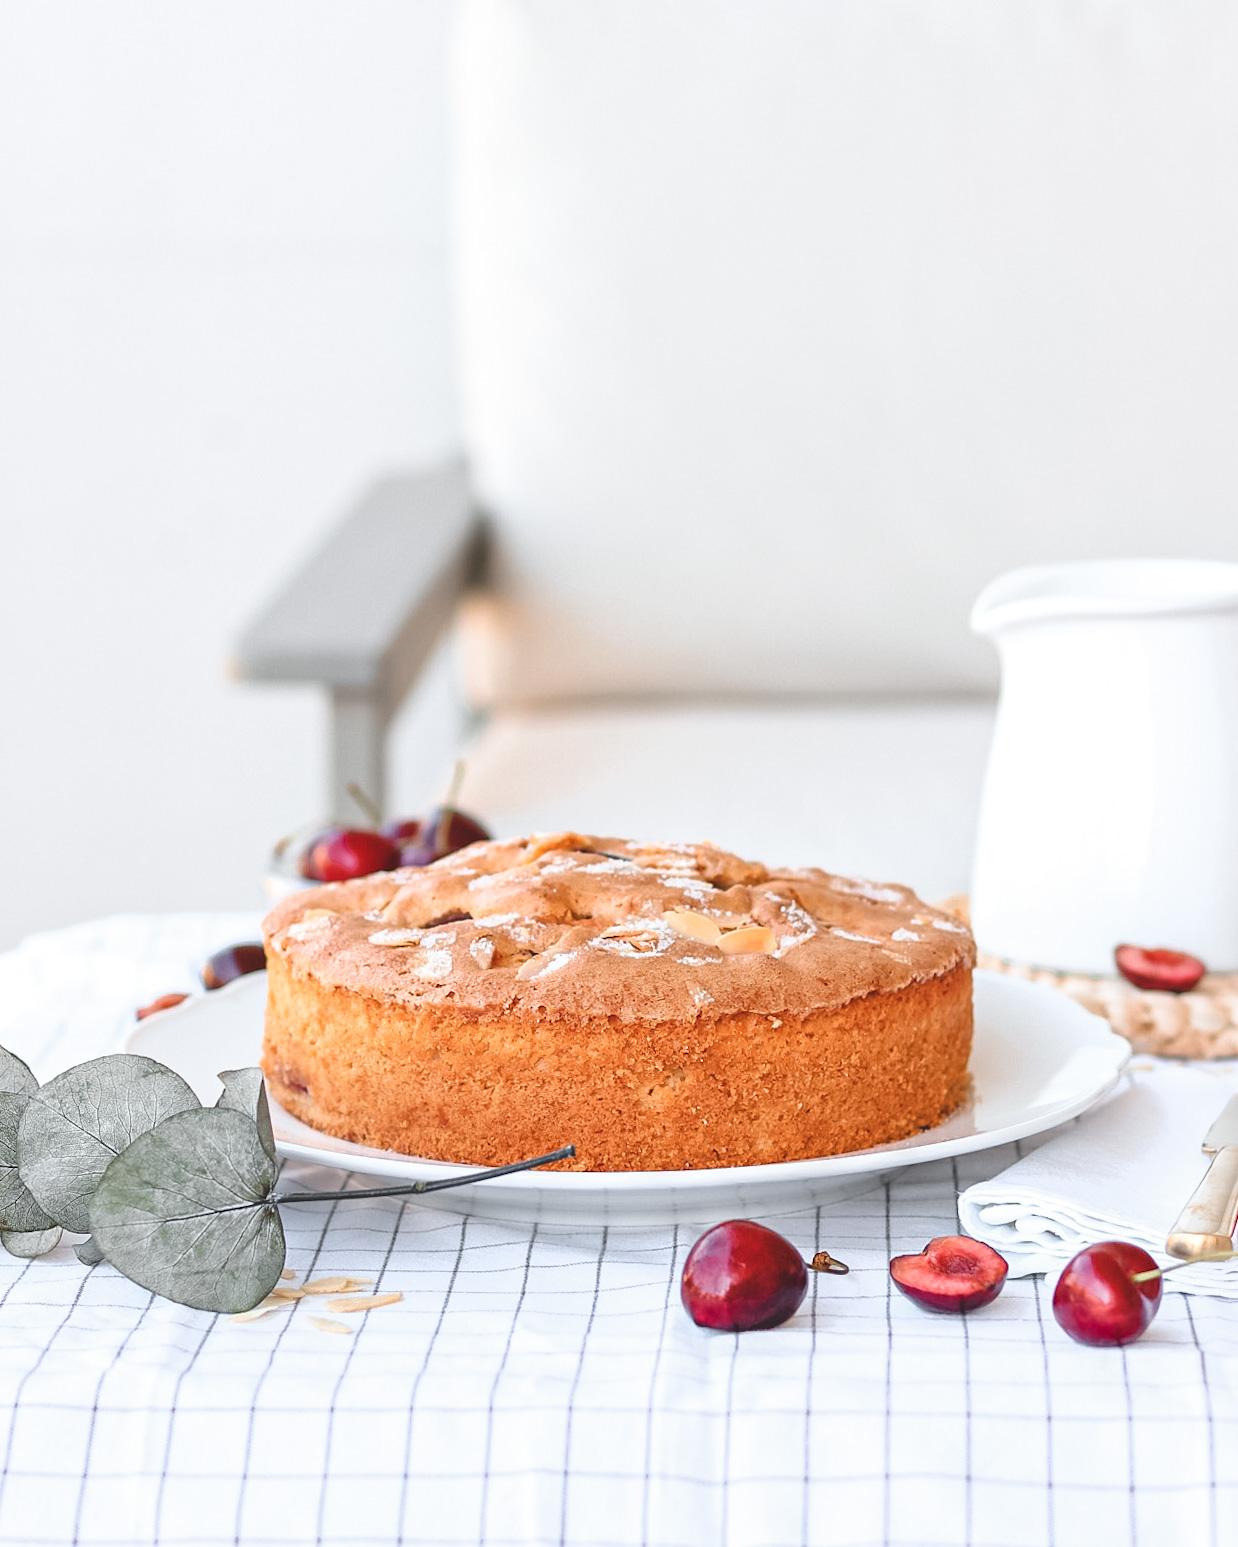 tavola con torta ciliegie eucalipto